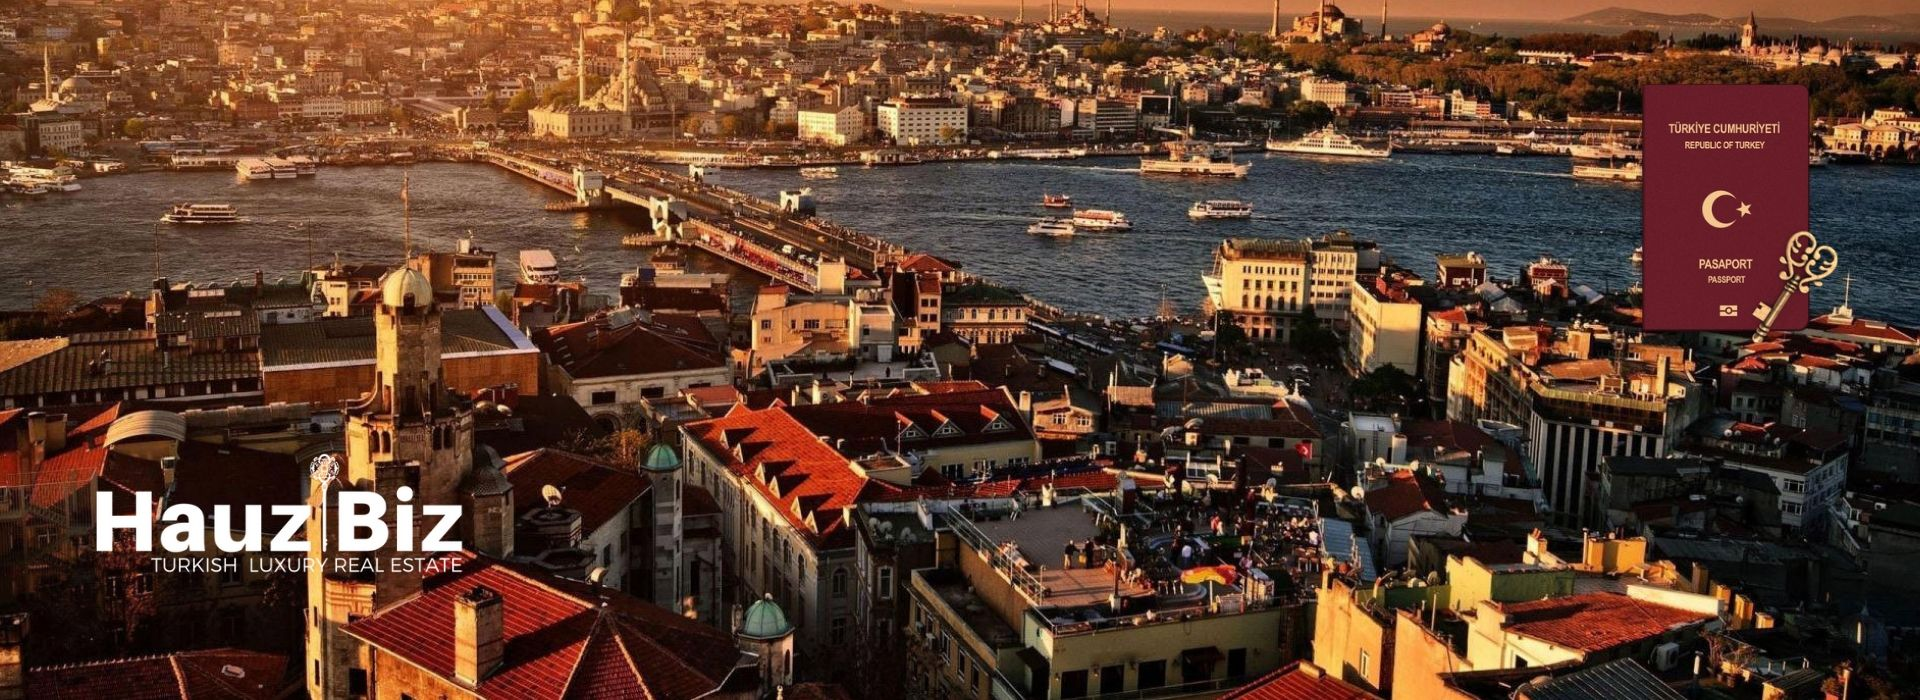 _Istanbul District Maps_HauzBiz